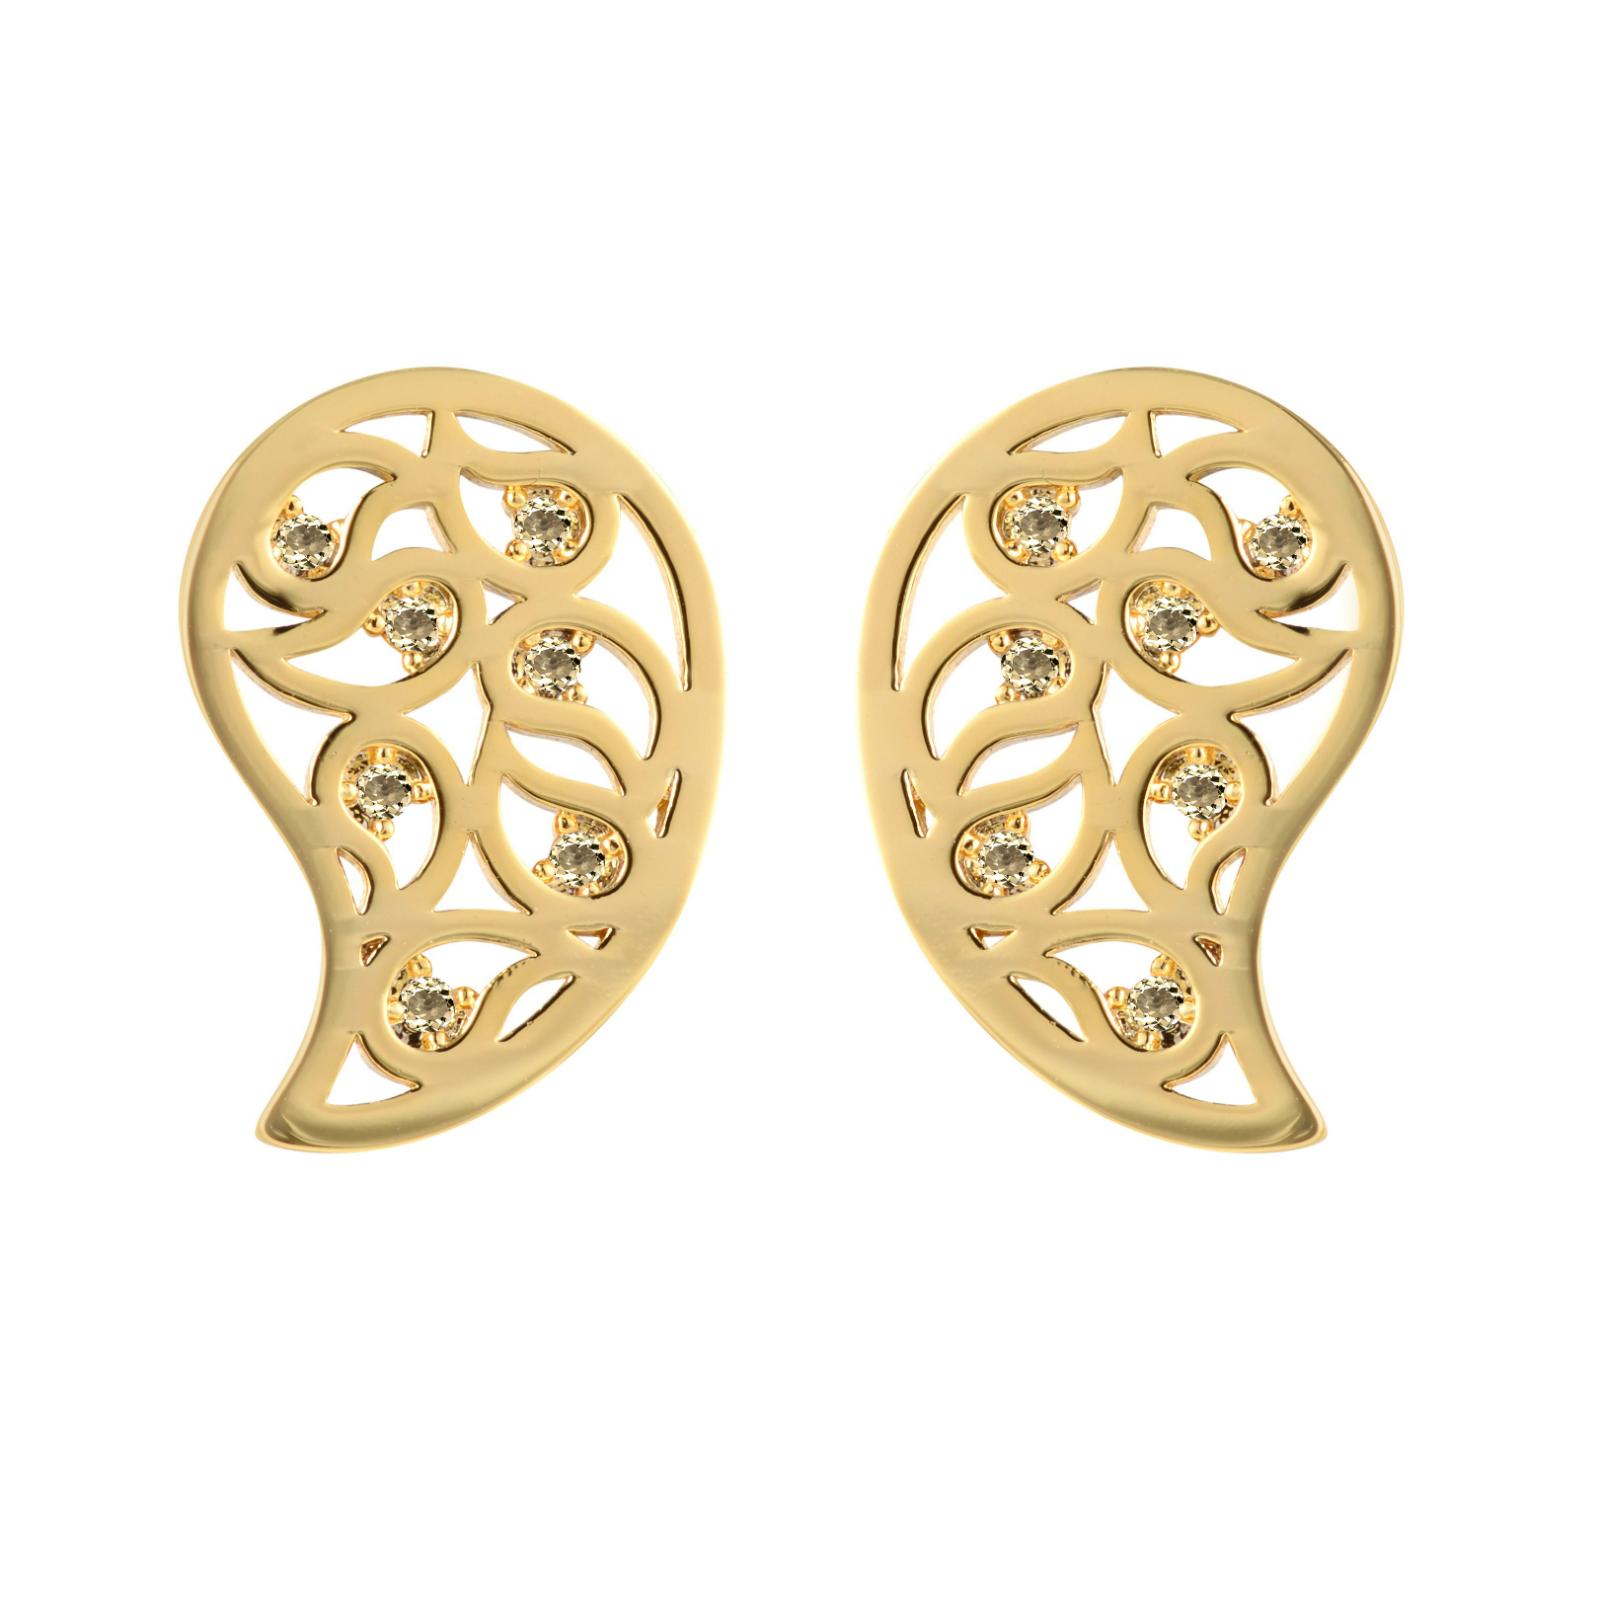 Sonal Bhaskaran Jaali Gold Paisley Earrings with Clear Cubic Zirconia WLPhEX